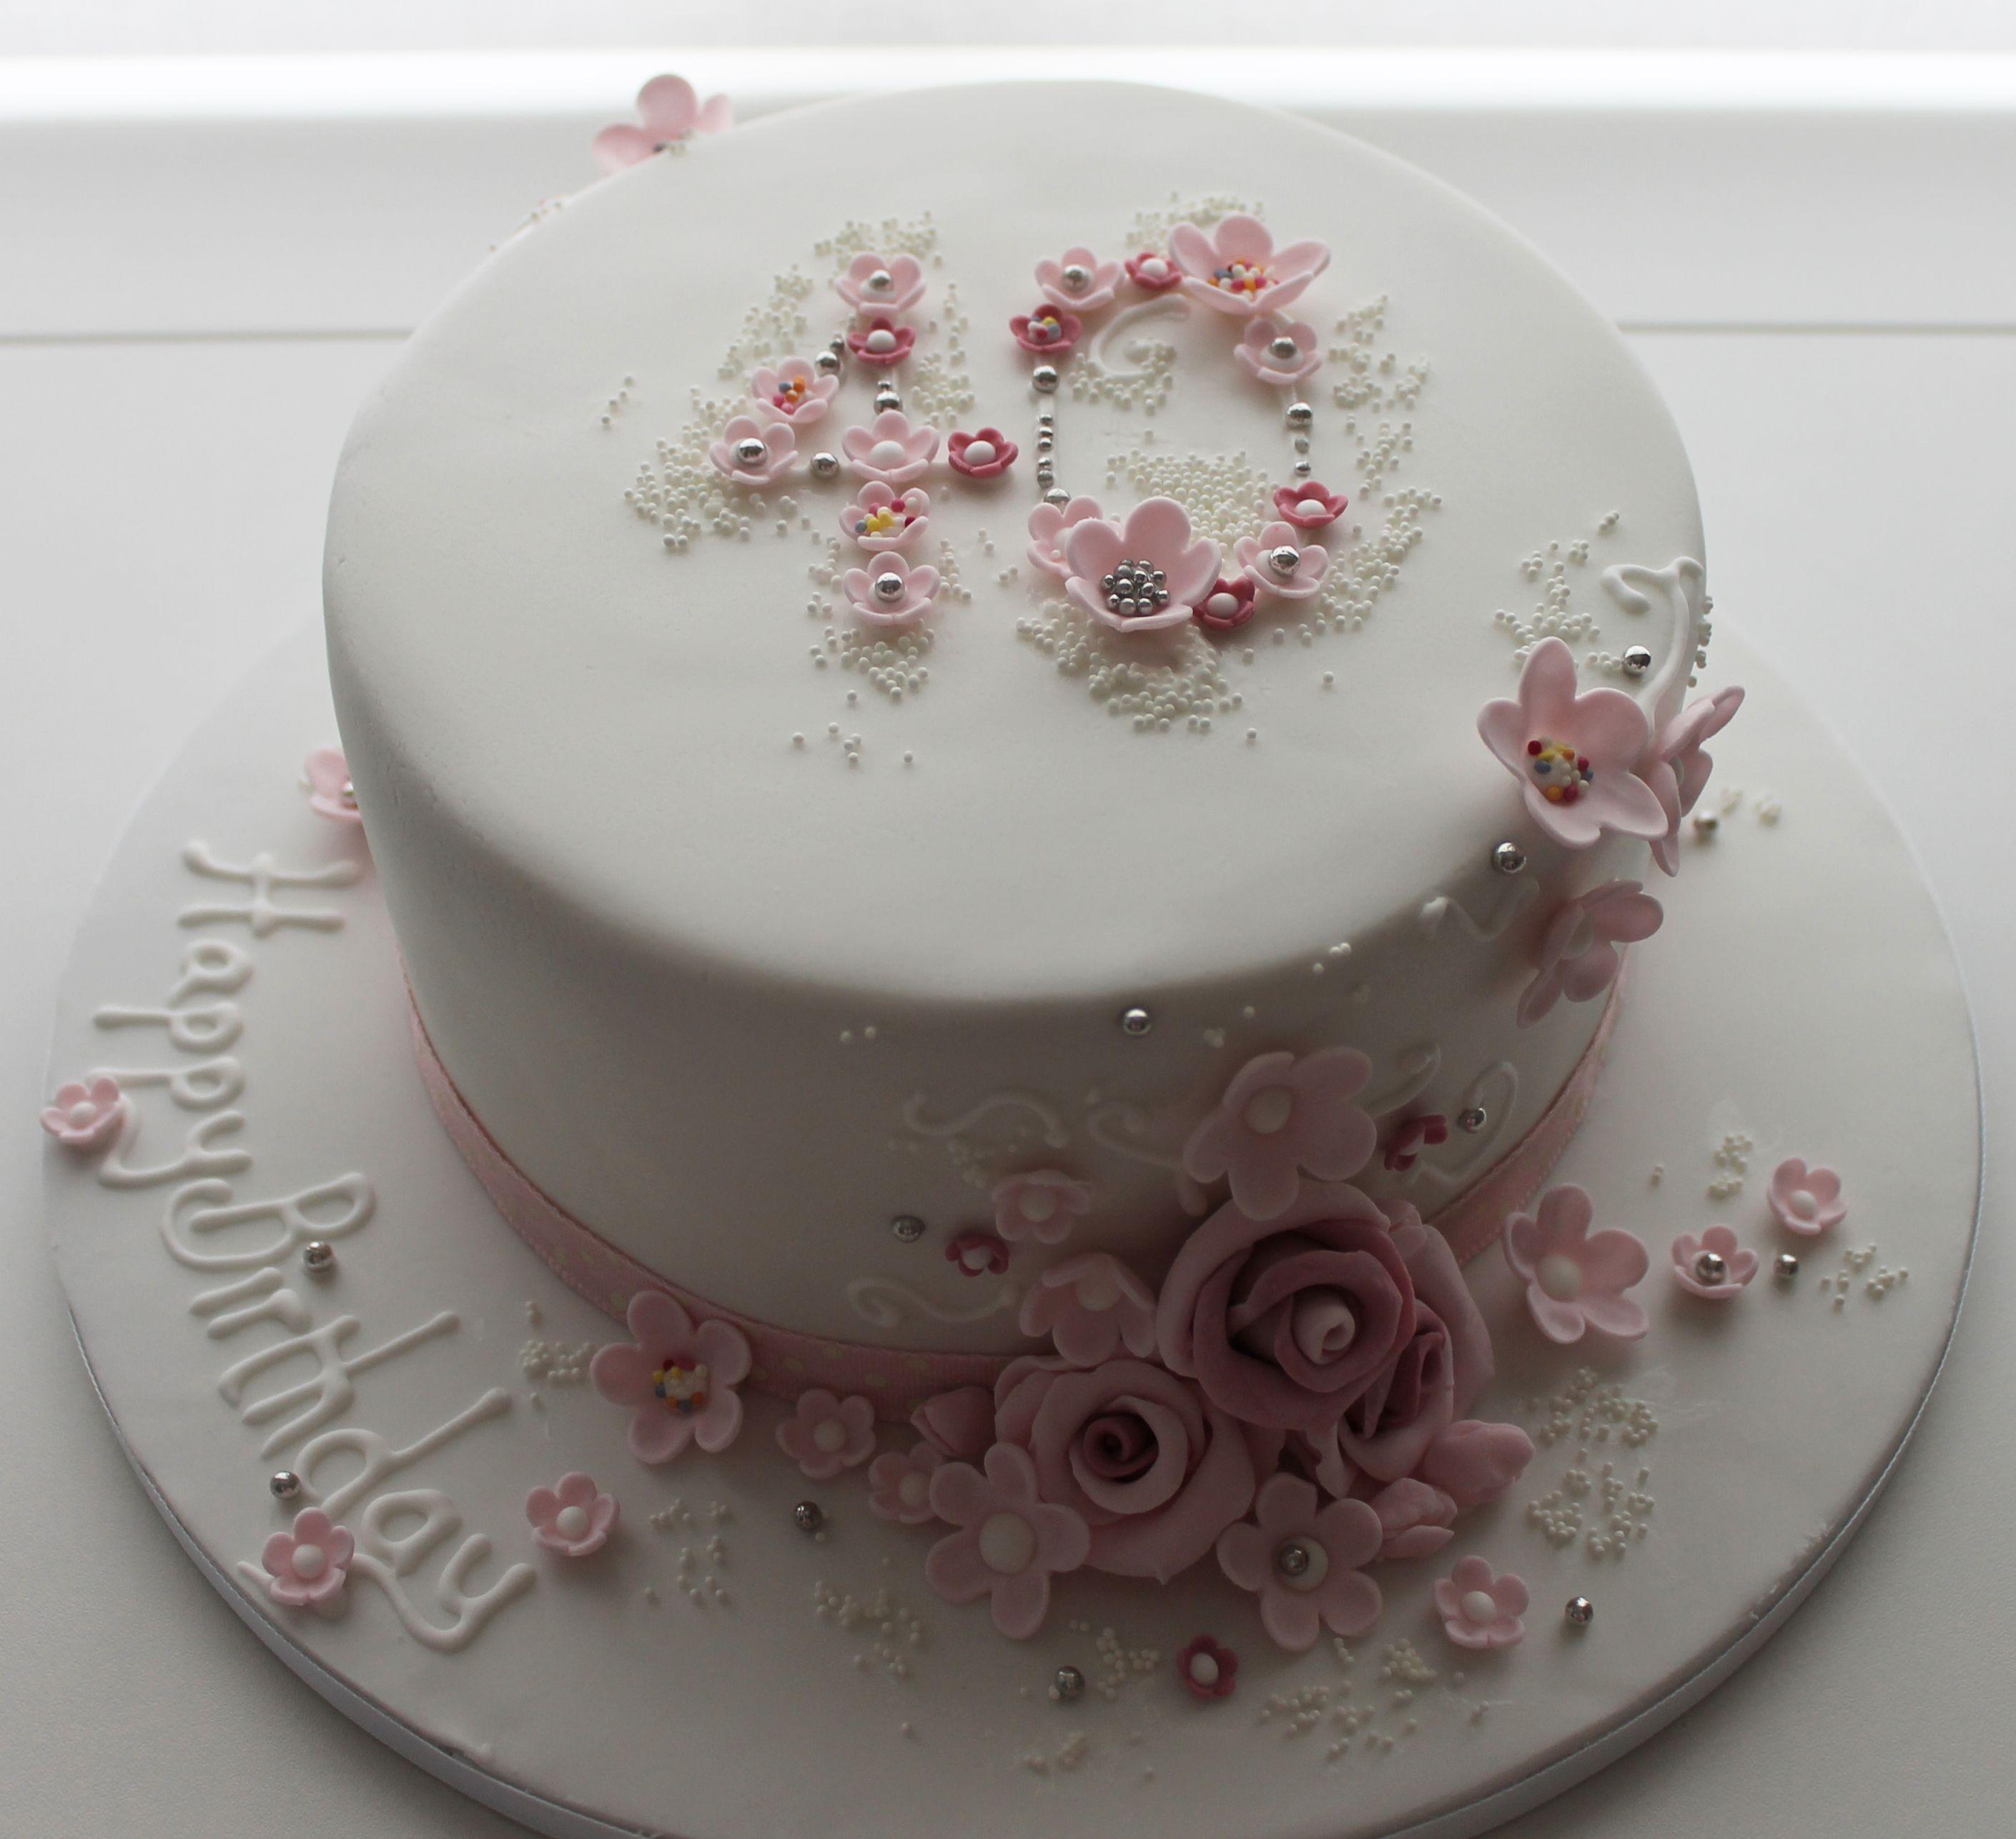 Stunning Cake Made By Jill The Cakemaker